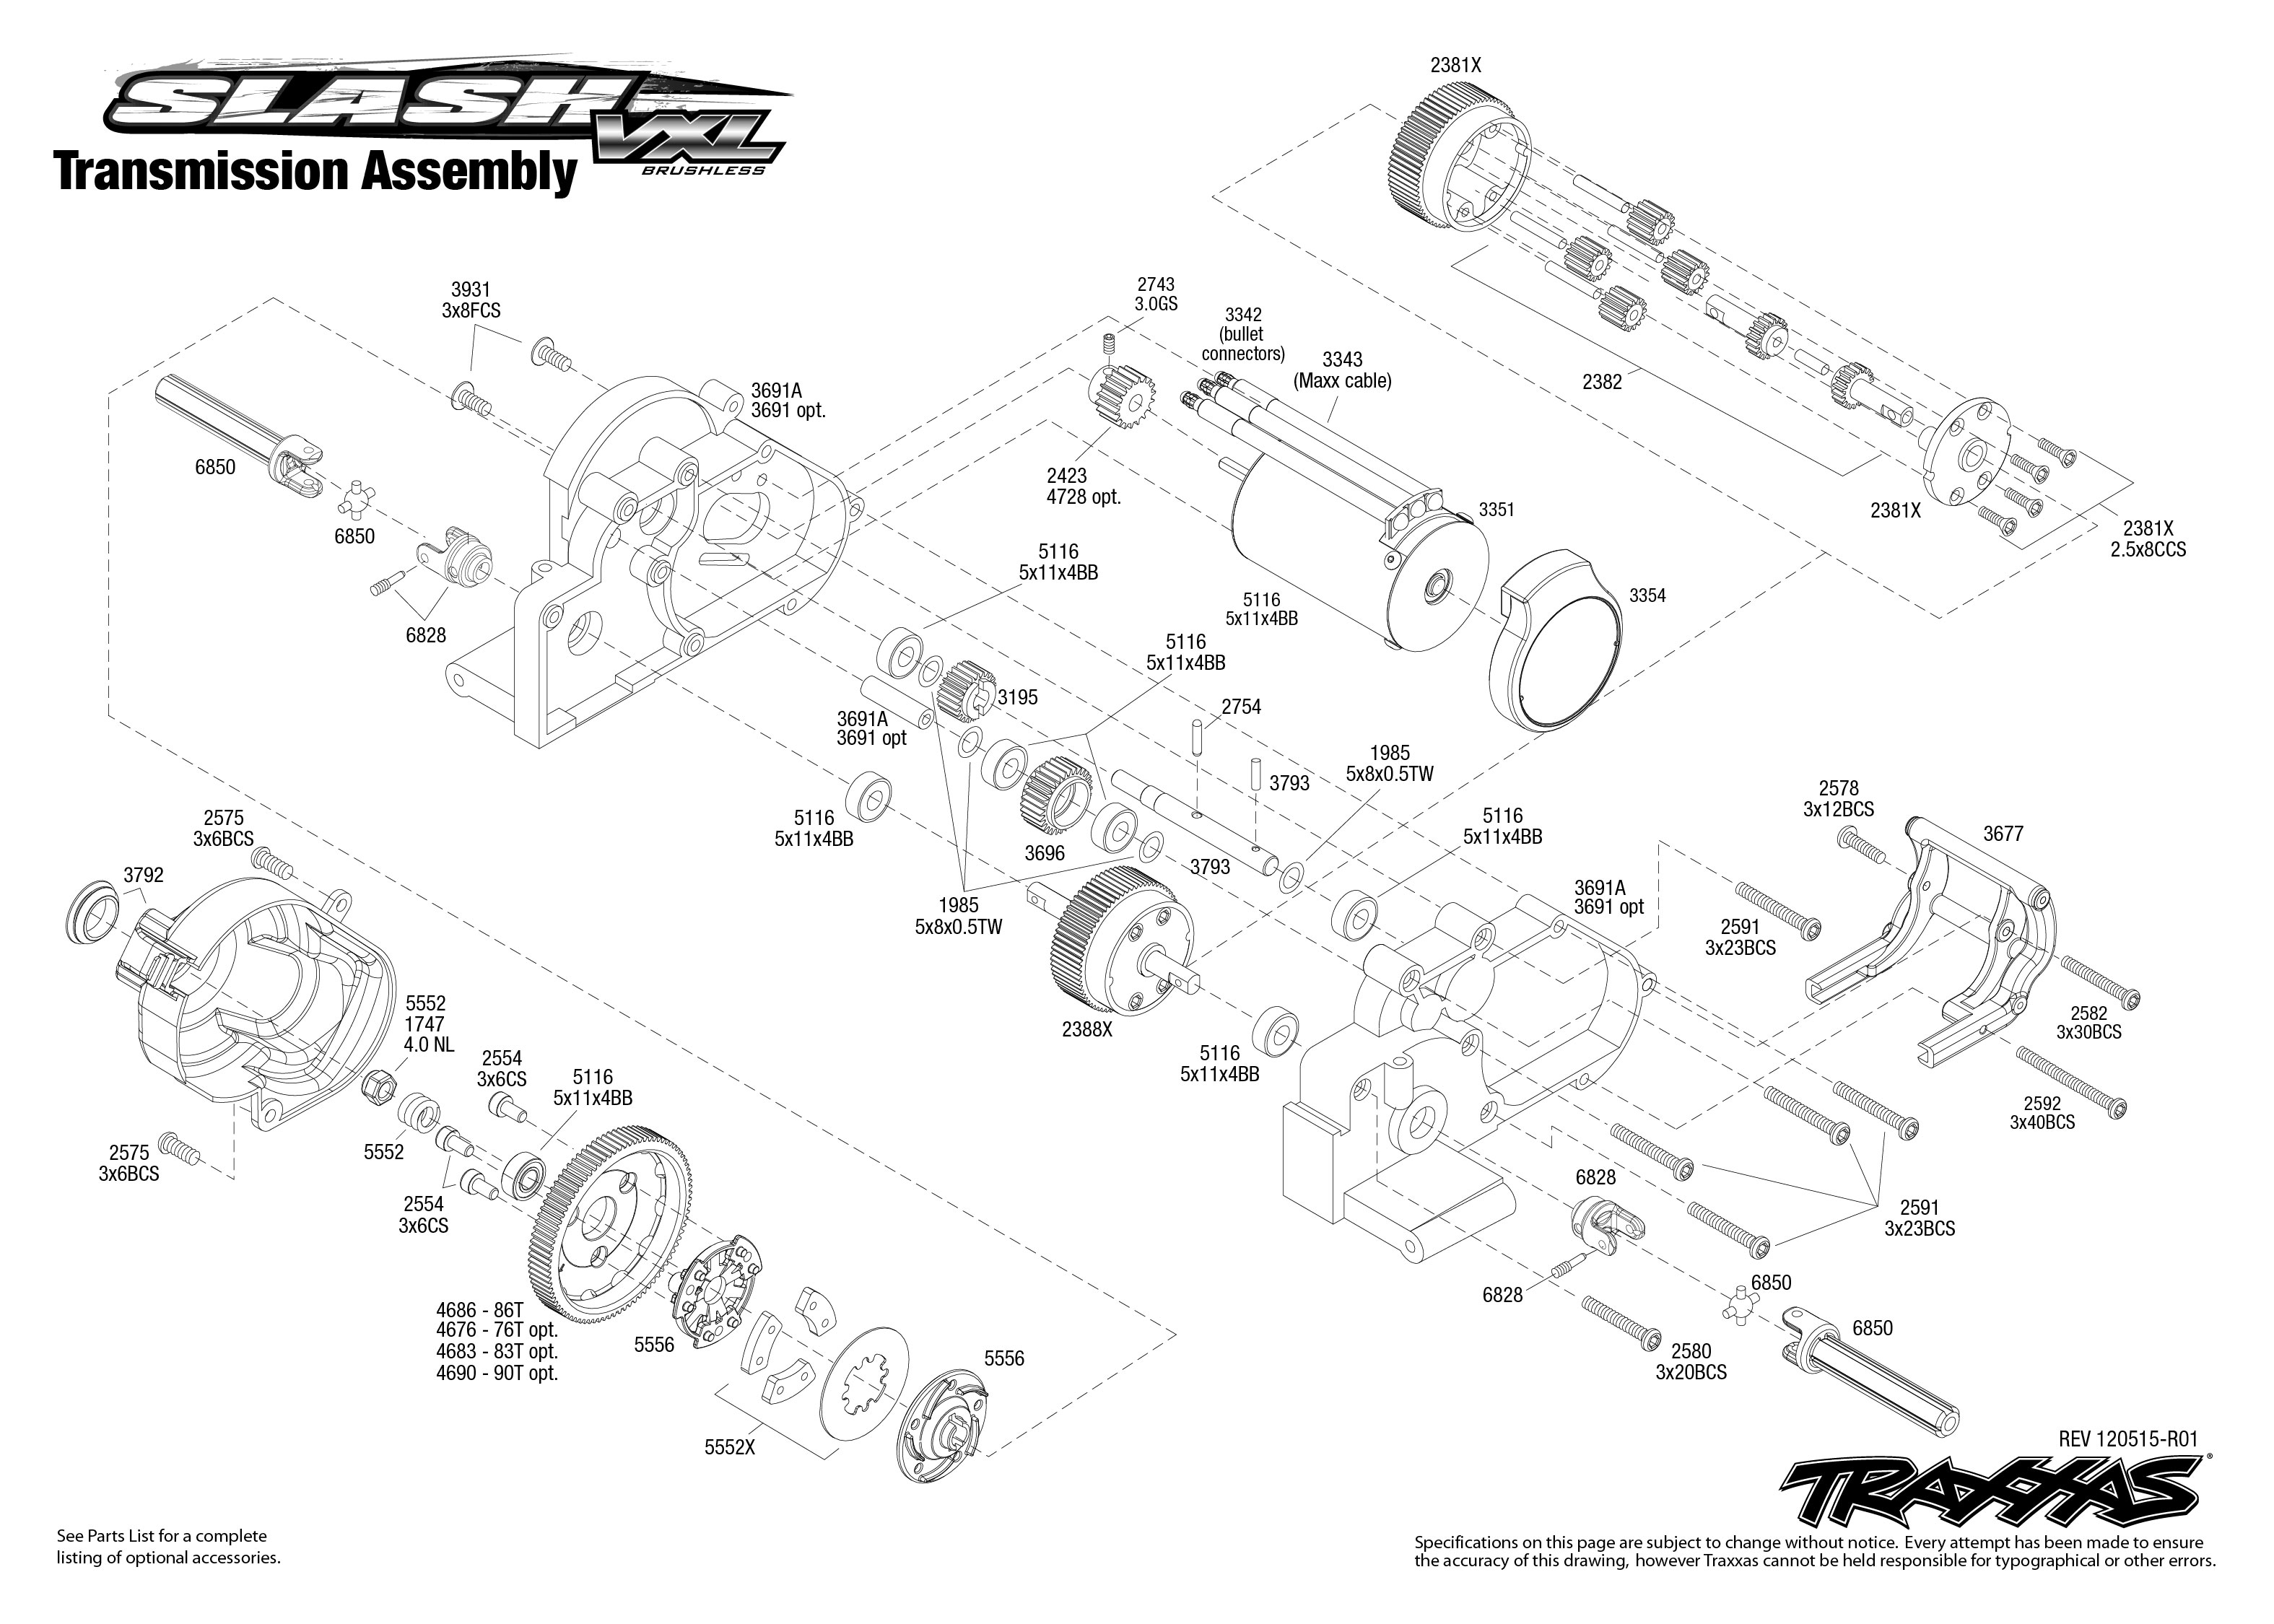 Traxxas 1 10 Scale Slash Vxl 2wd Brushless Short Course Truck